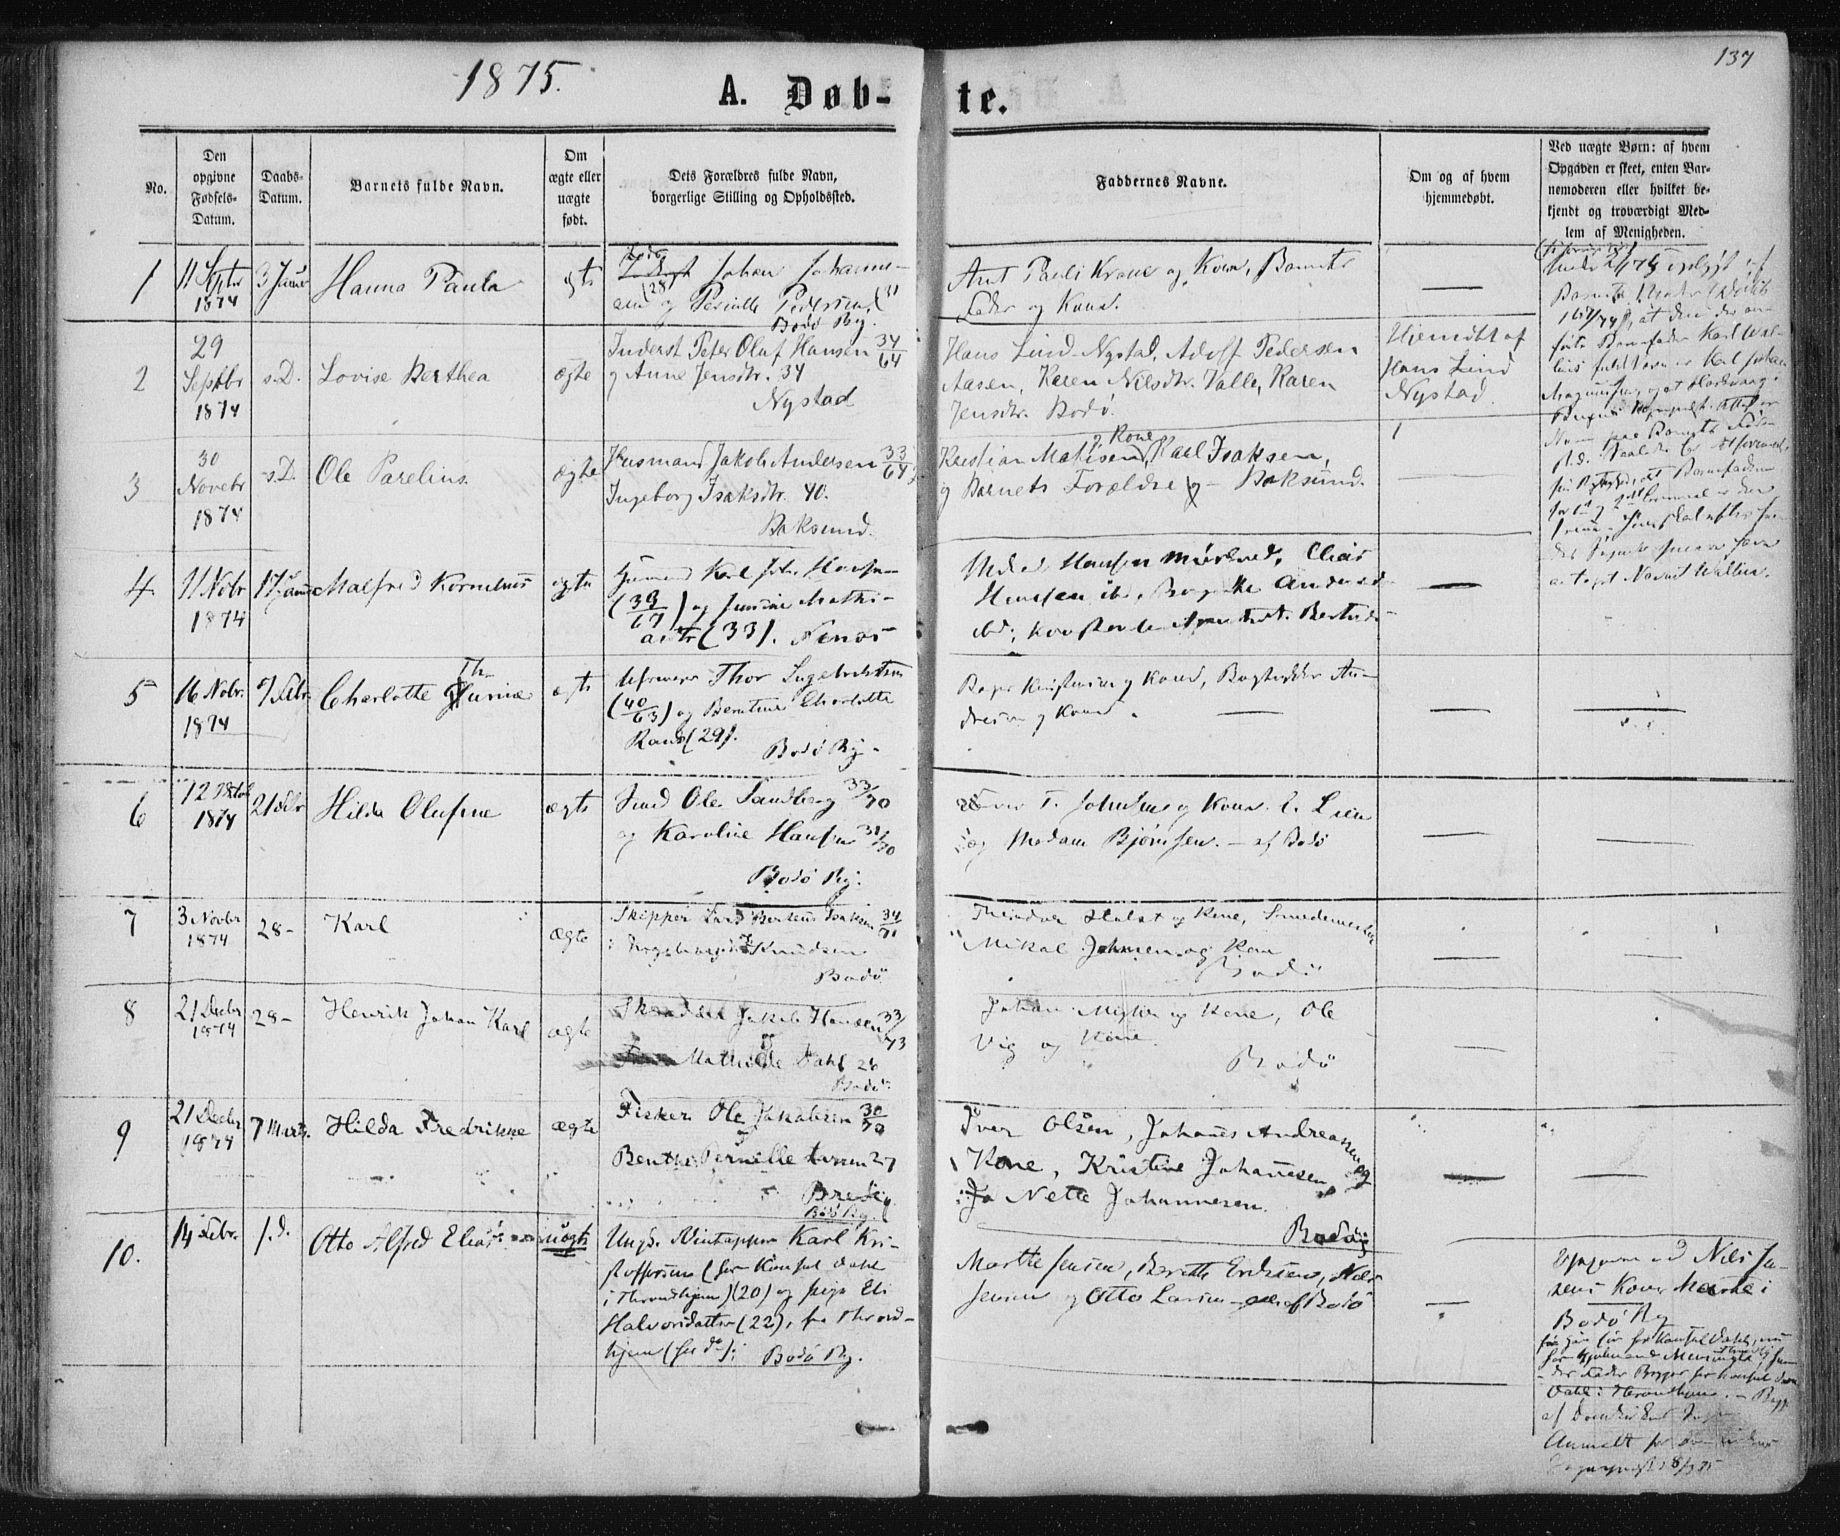 SAT, Ministerialprotokoller, klokkerbøker og fødselsregistre - Nordland, 801/L0008: Ministerialbok nr. 801A08, 1864-1875, s. 137